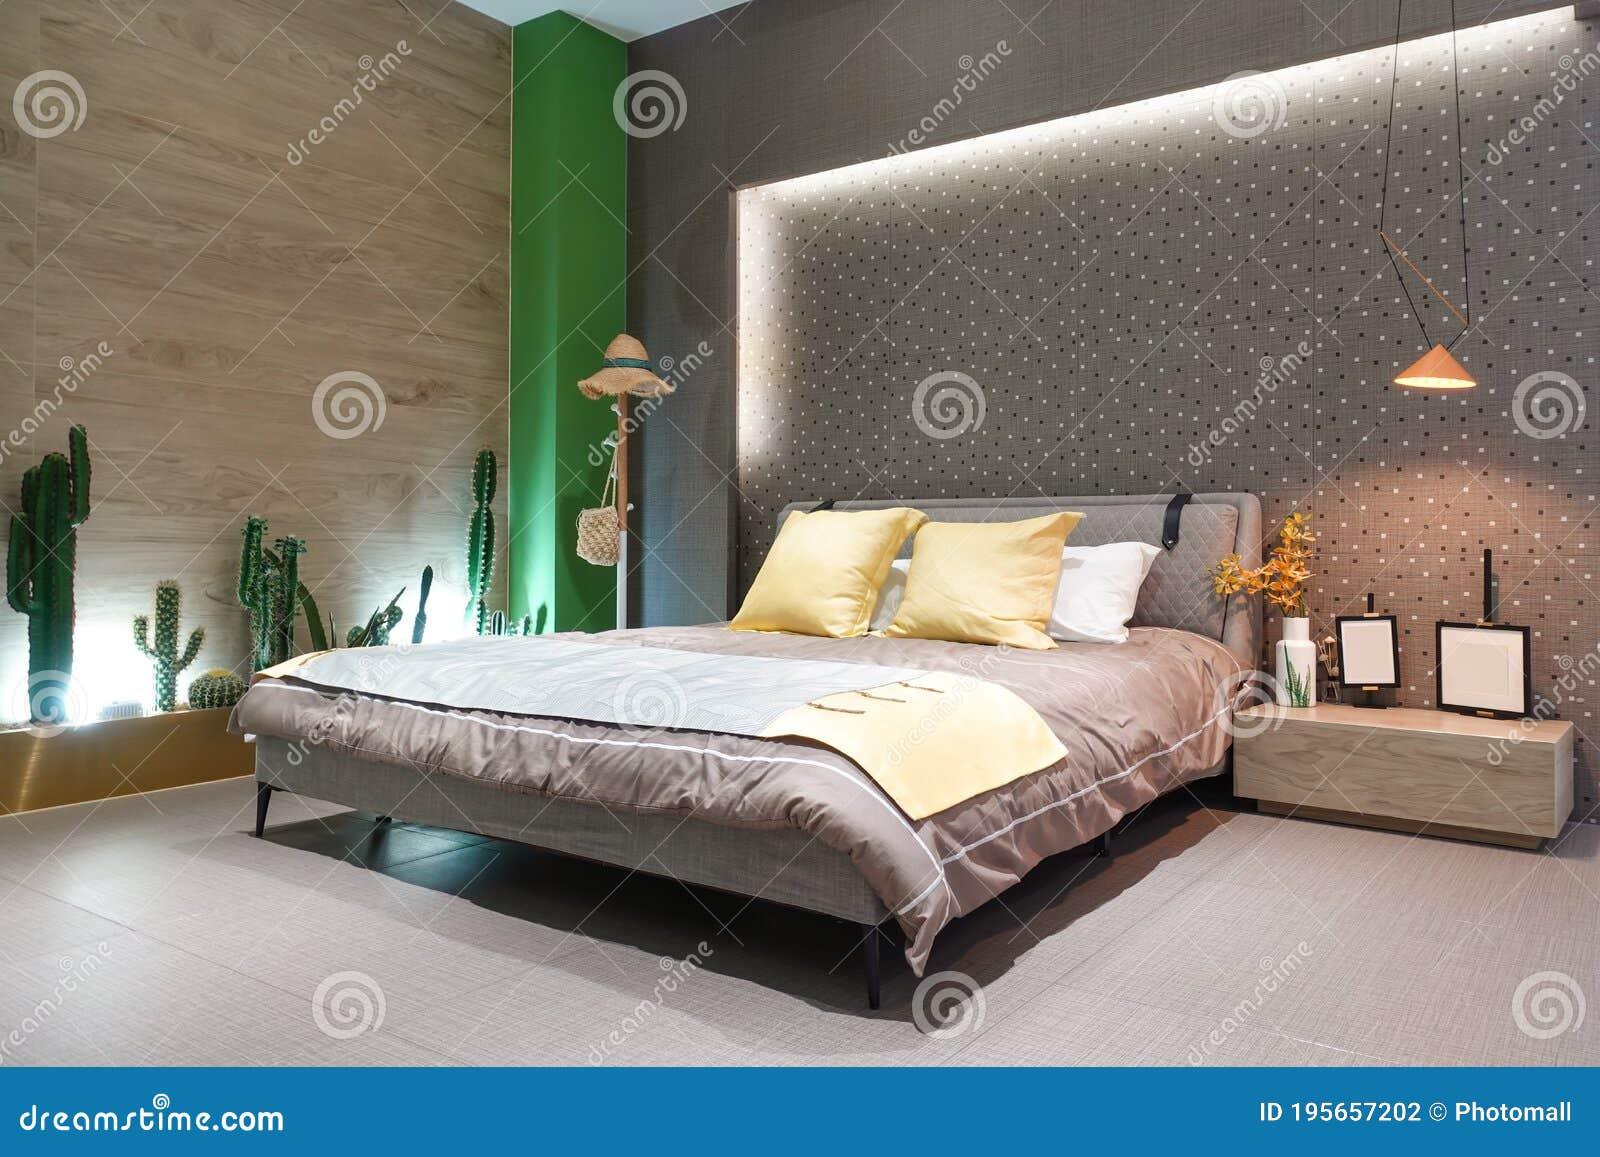 Modern Bedroom Interior Bed Bedside Table Led Light Stock Photo Image Of Bedhead Decoration 195657202